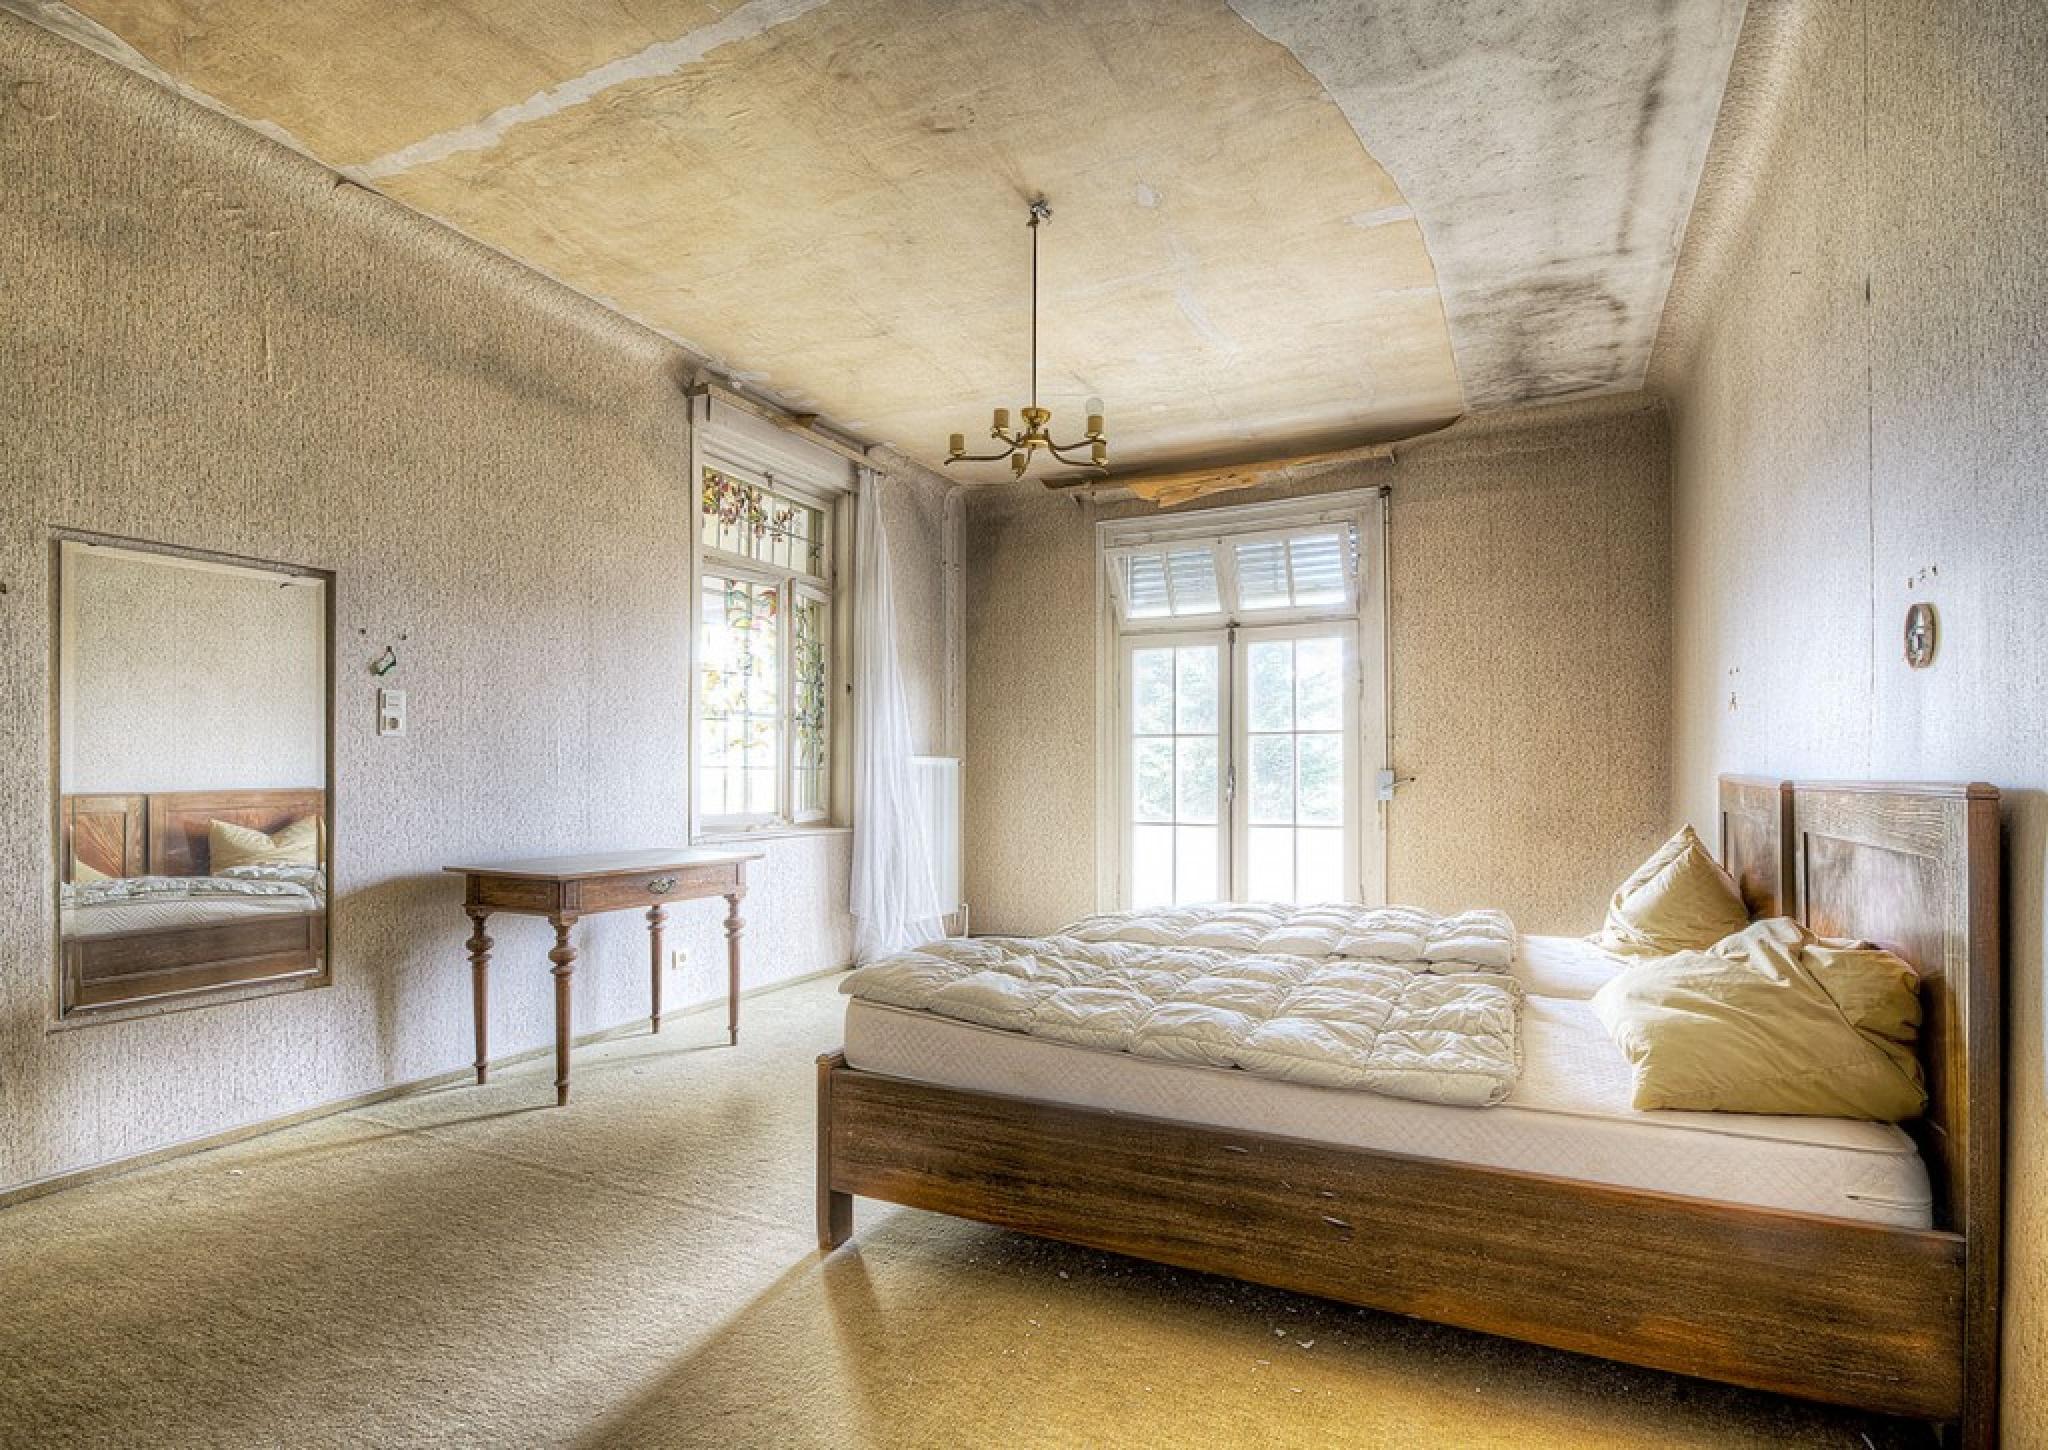 Abandoned hotel room  by BlackbirdStreet